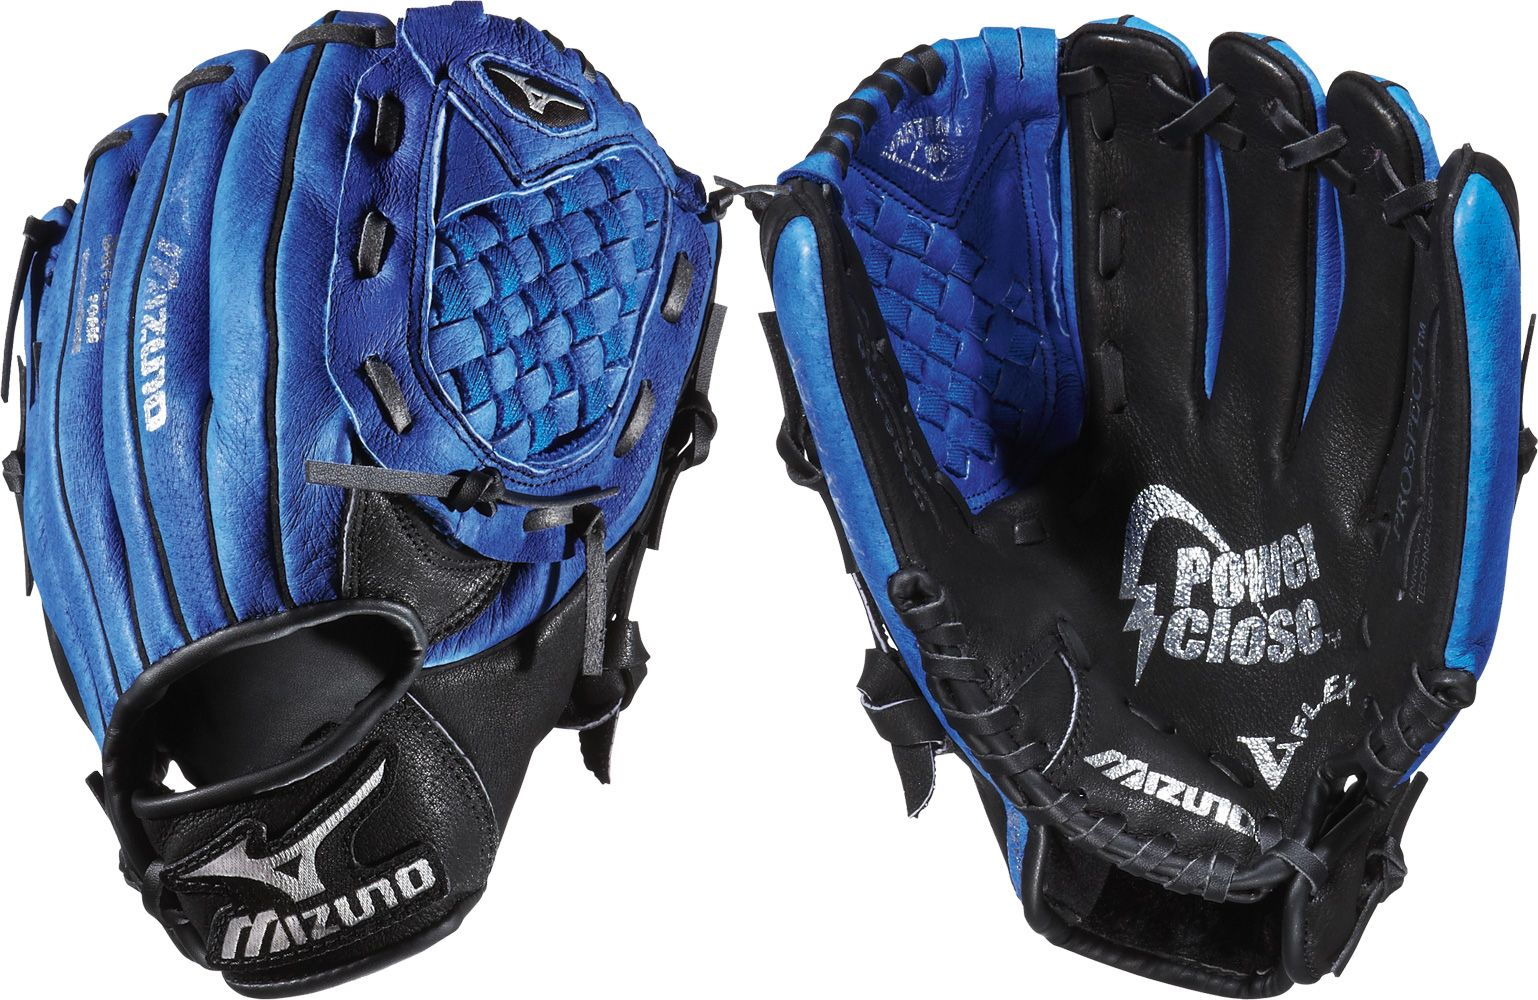 mizuno baseball gloves mizuno 9.5 UTBJOCQ